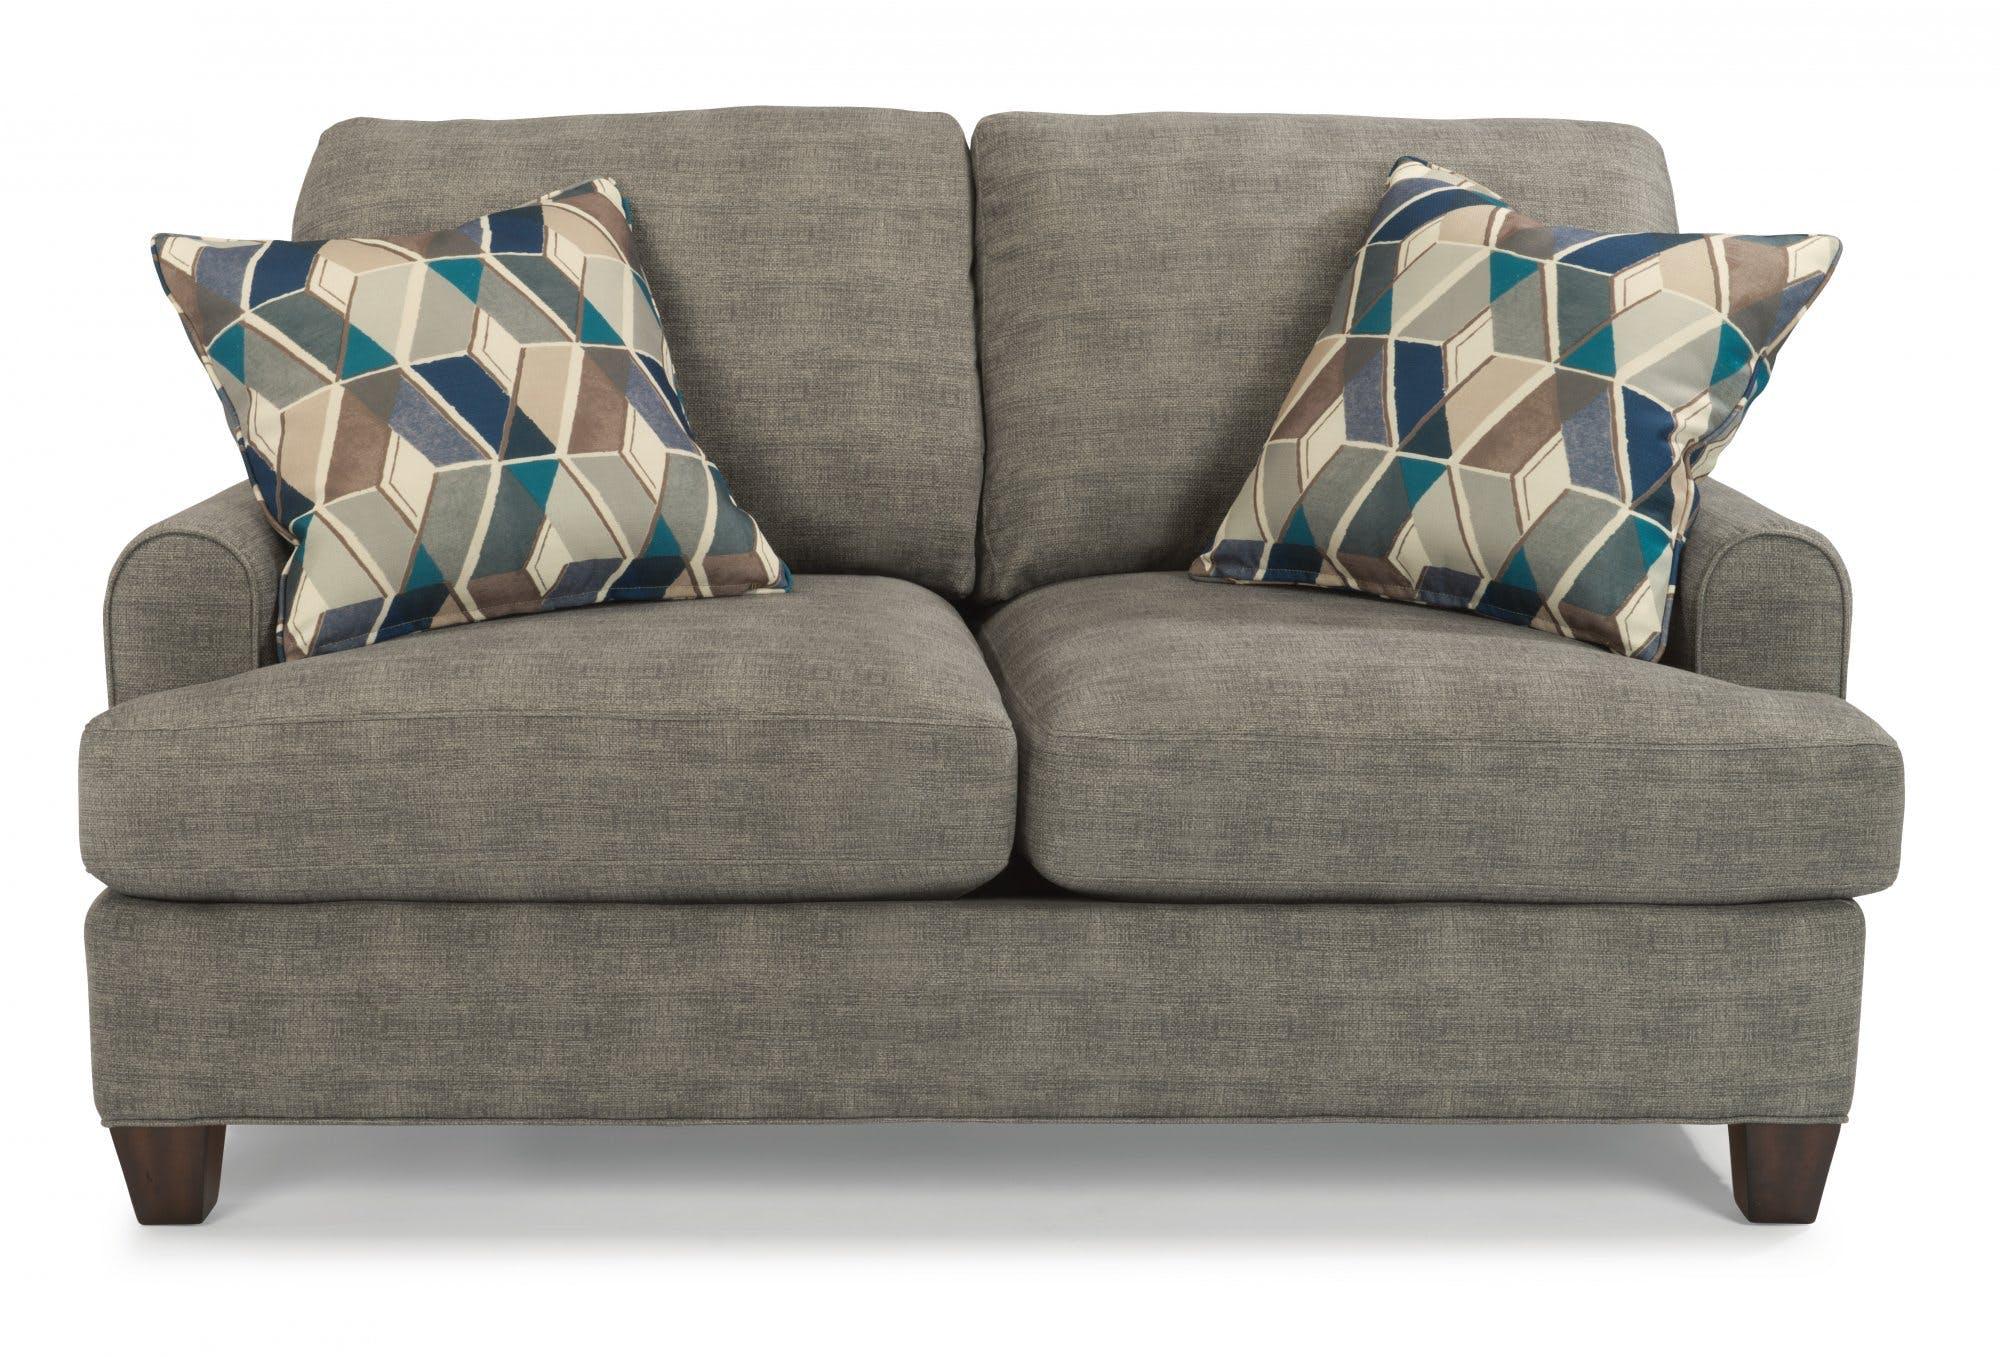 Flexsteel Living Room Fabric Loveseat 5685-20 - Indian River